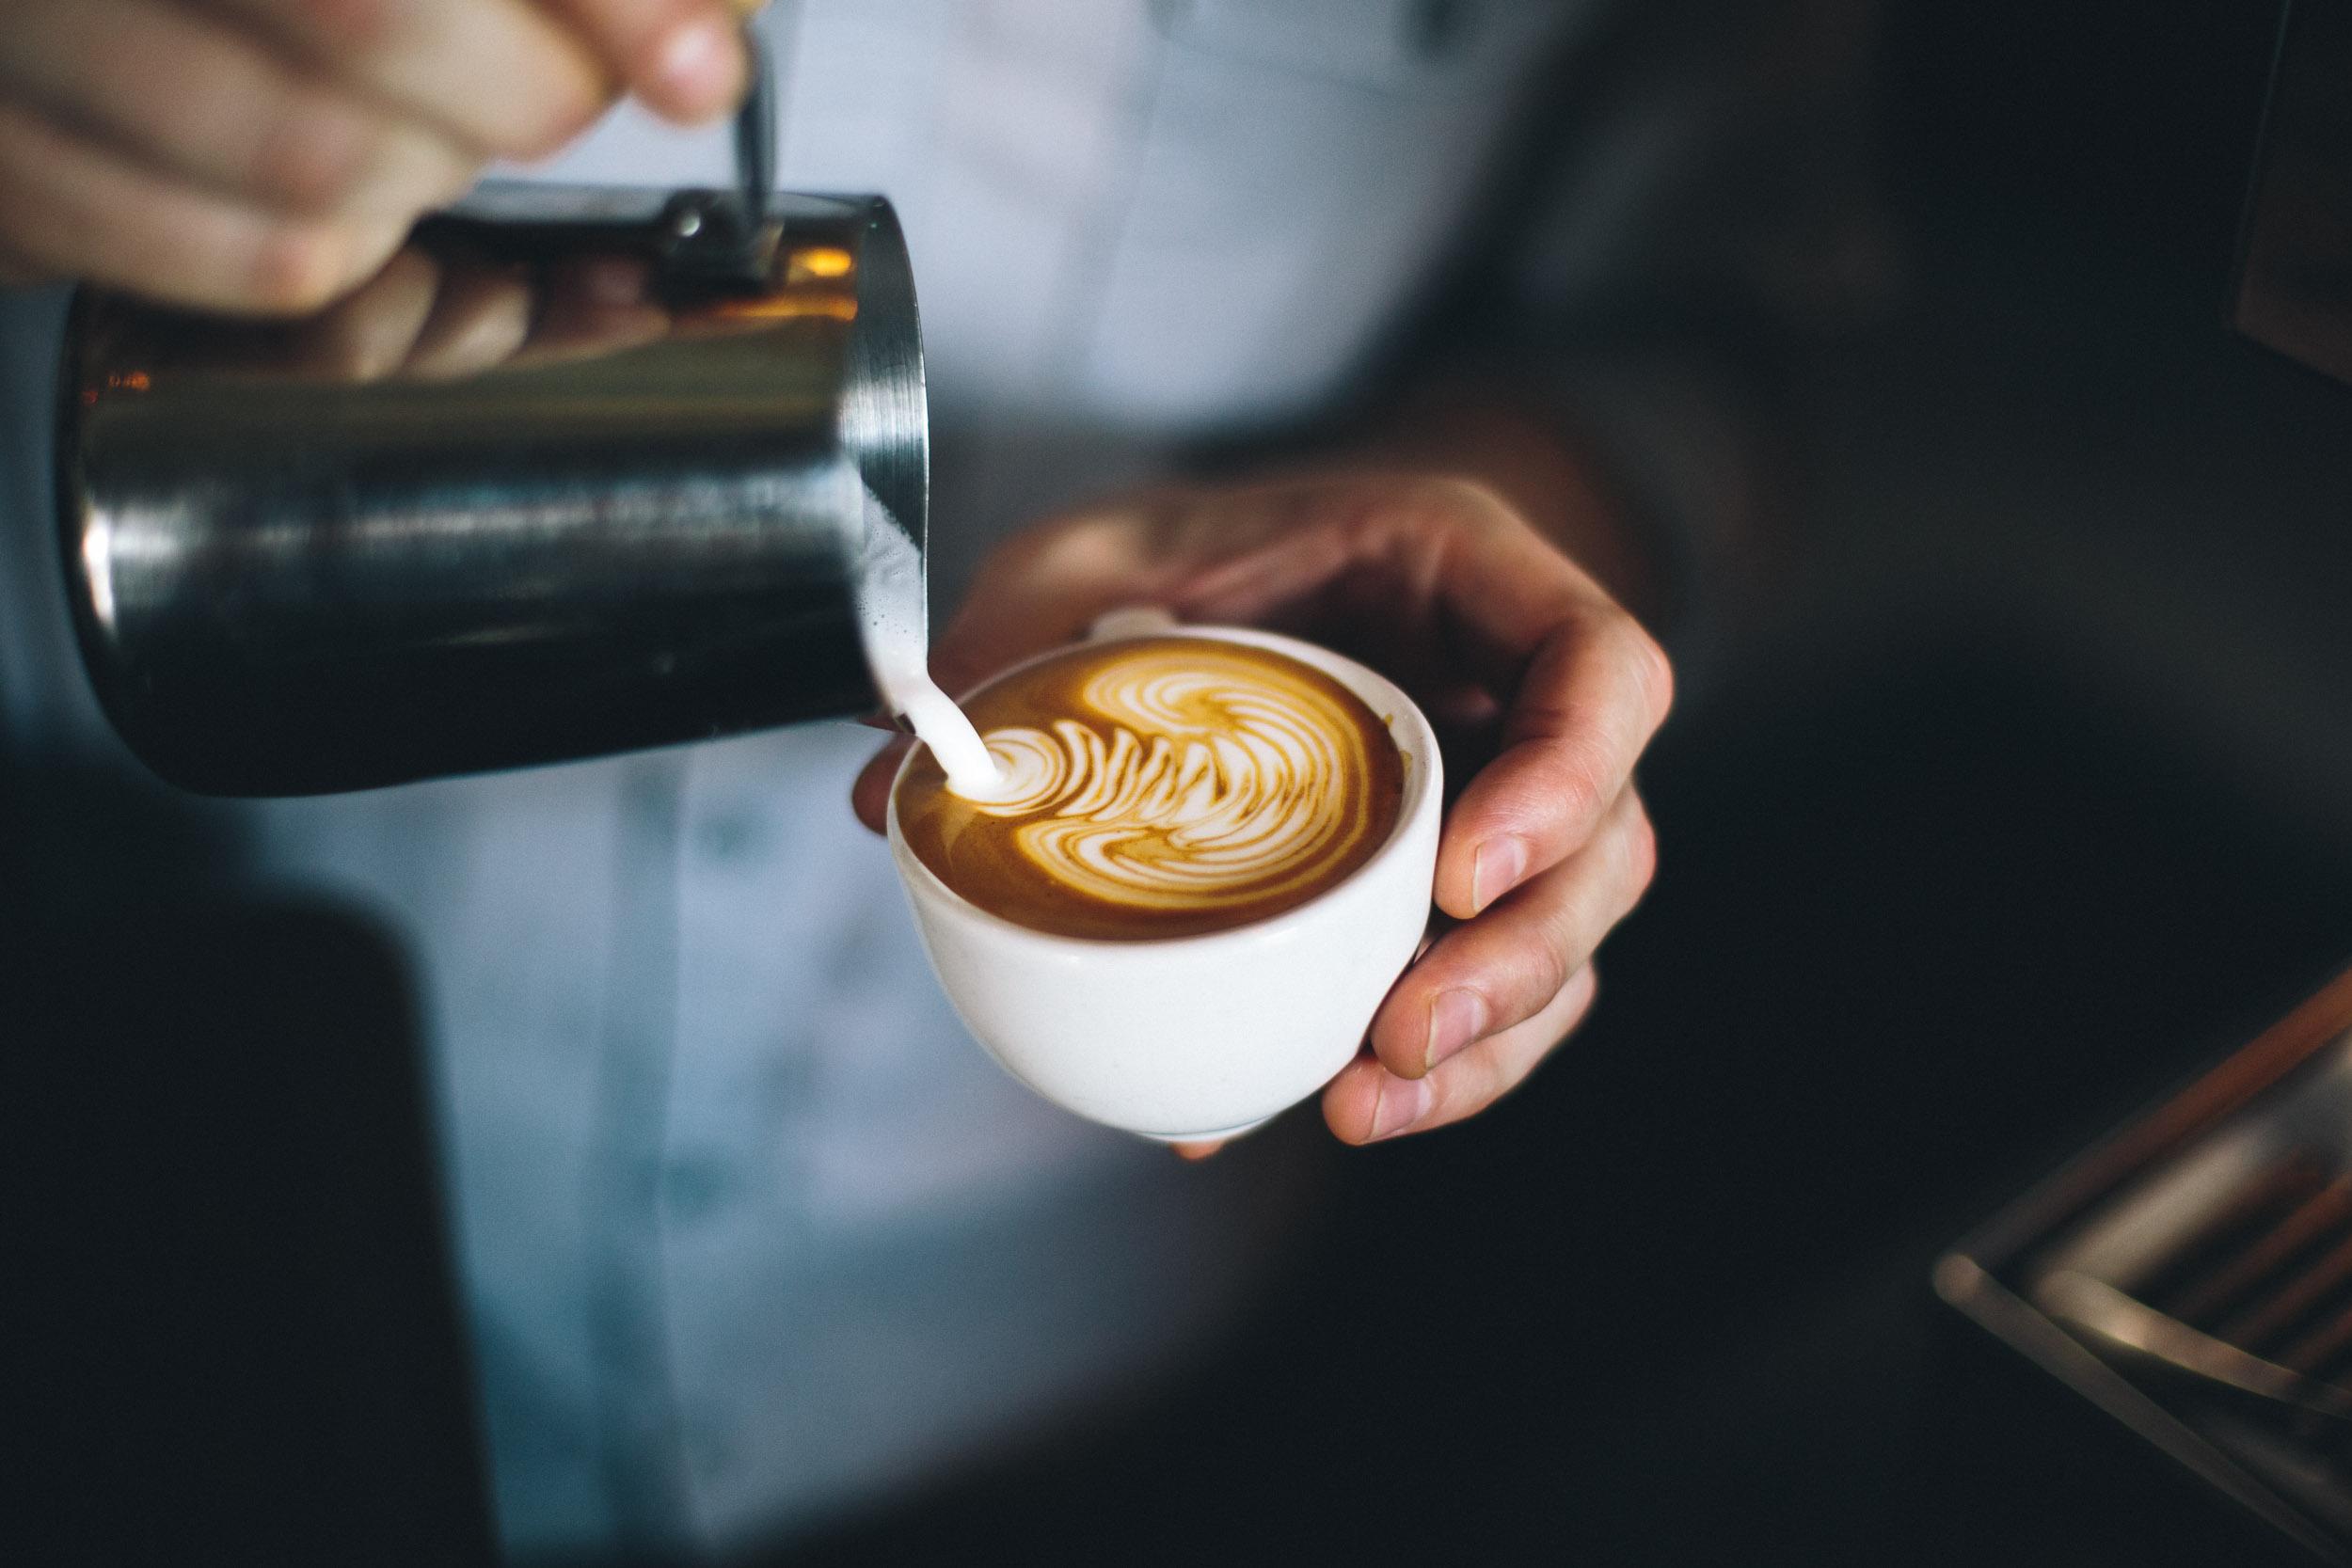 jimmy-rowalt-atlanta-coffee-food-drink-photography-068.jpg